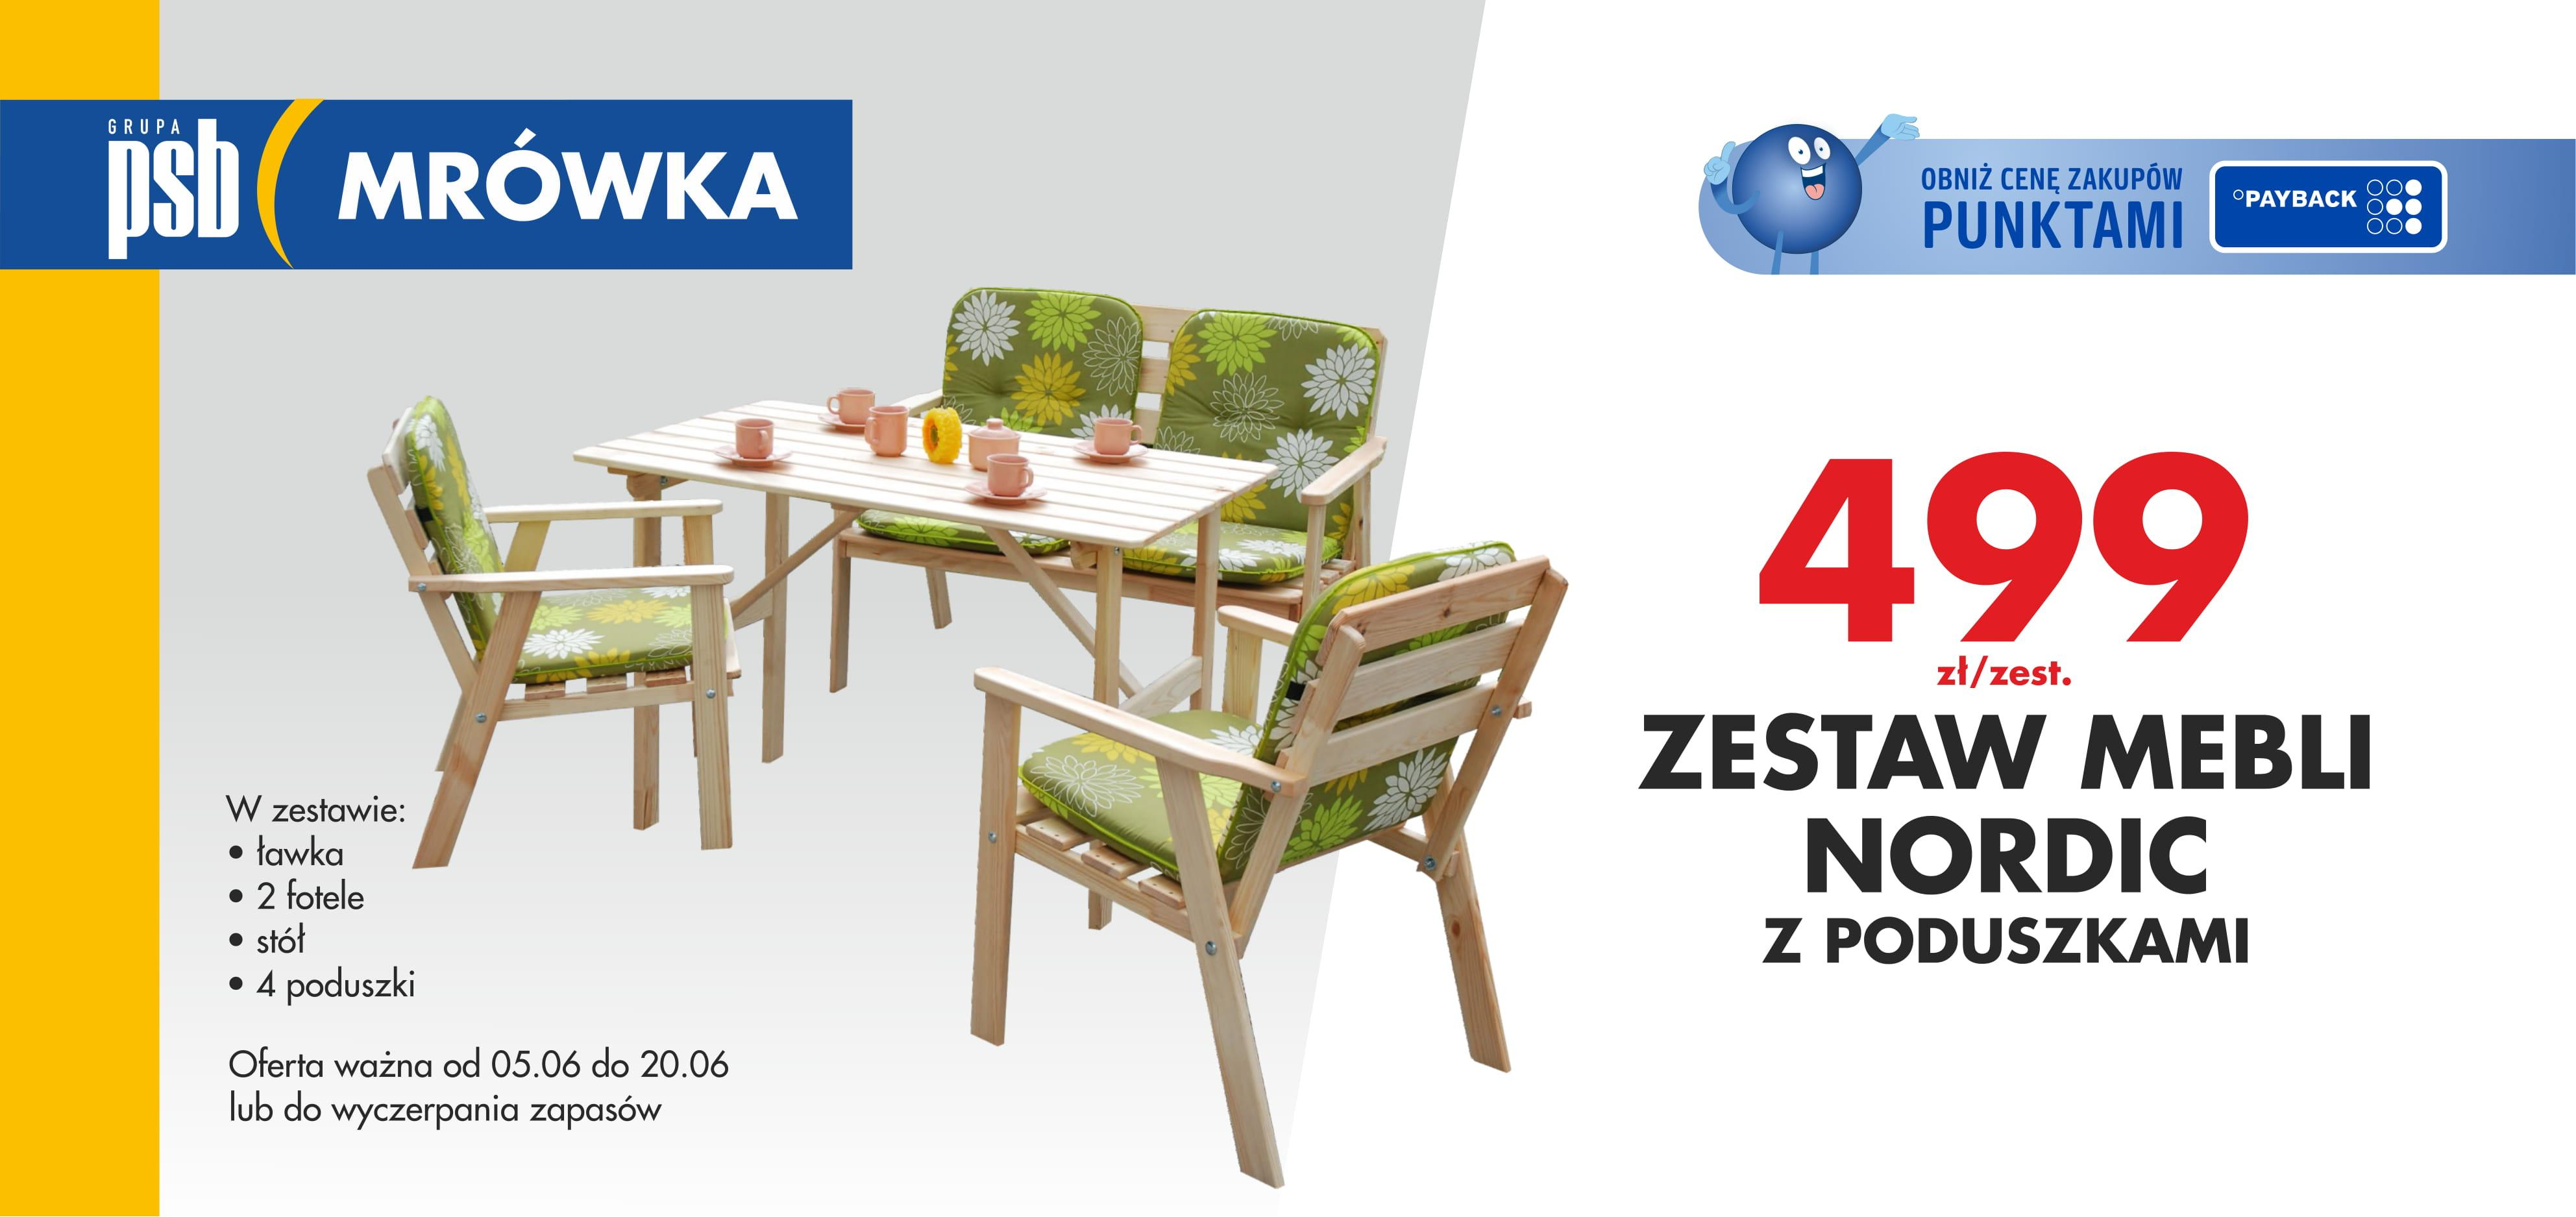 Zestaw-mebli-Nordic-504x238-1